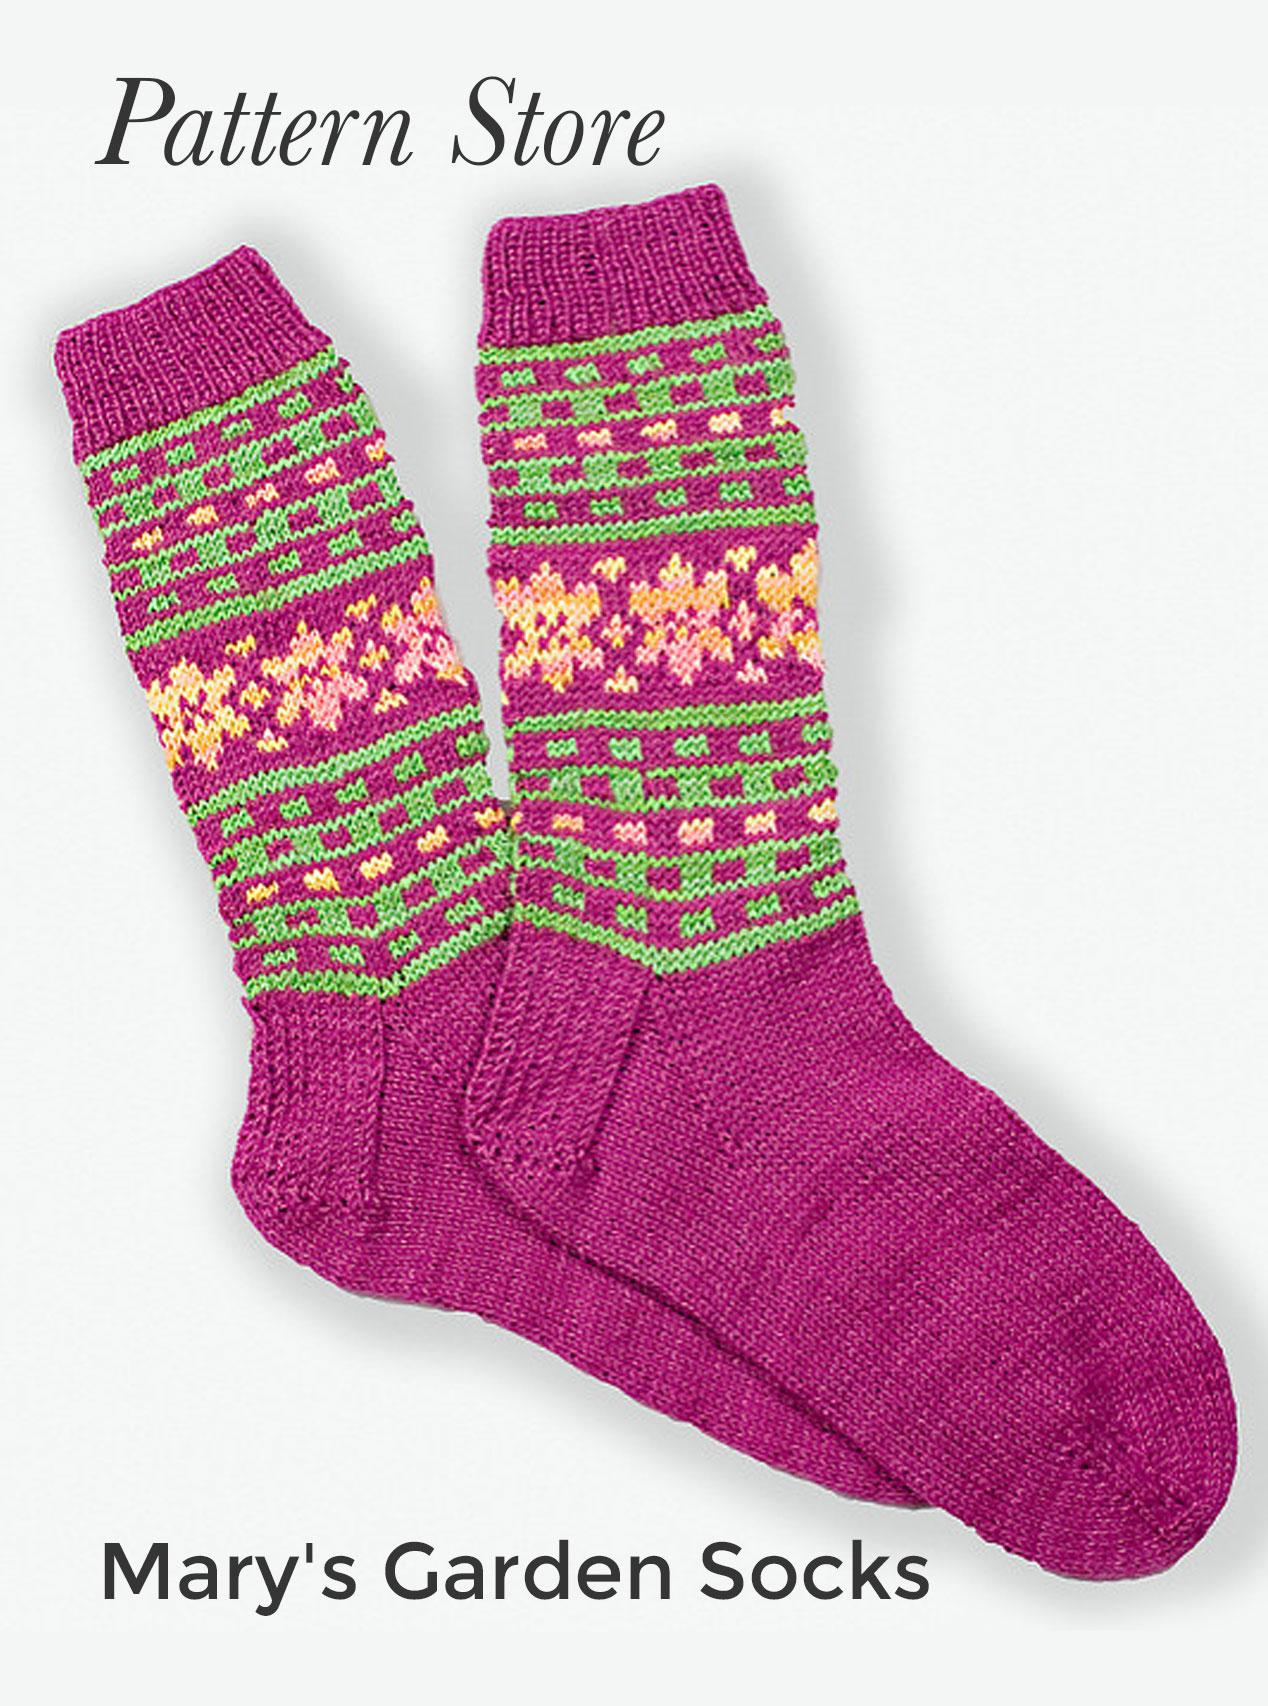 Mary's Garden Socks